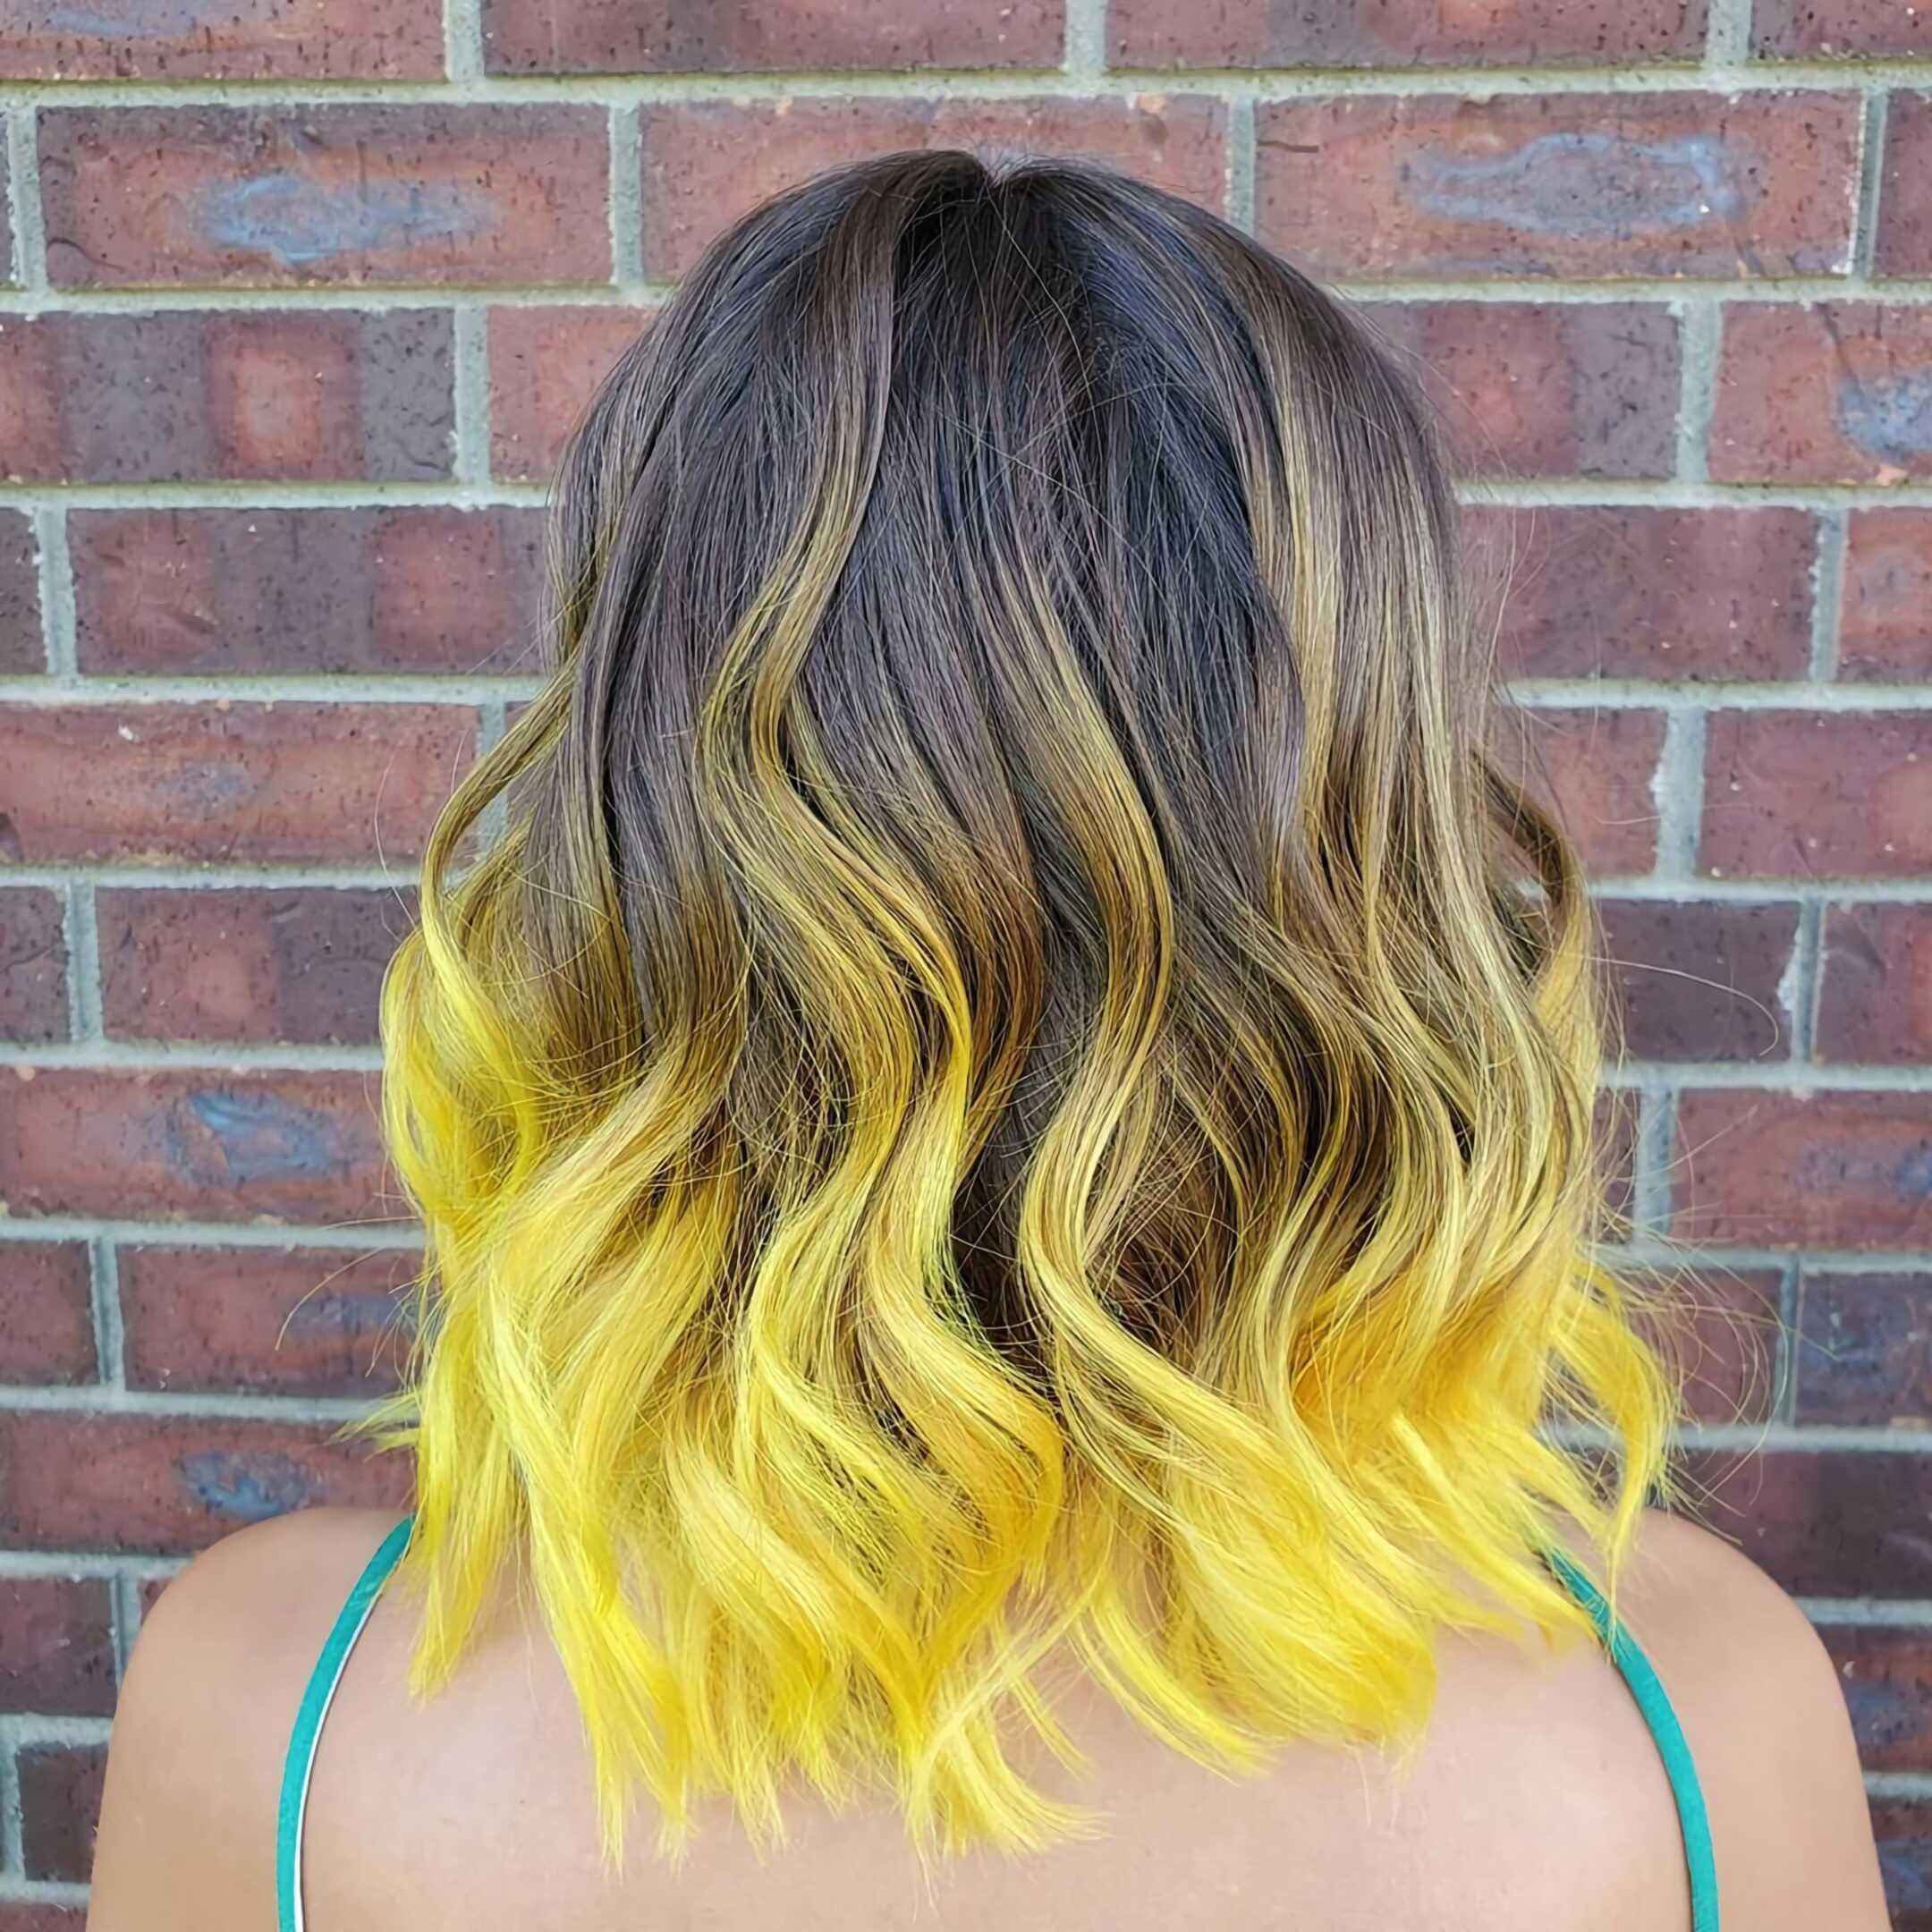 желтые волосы с омбре